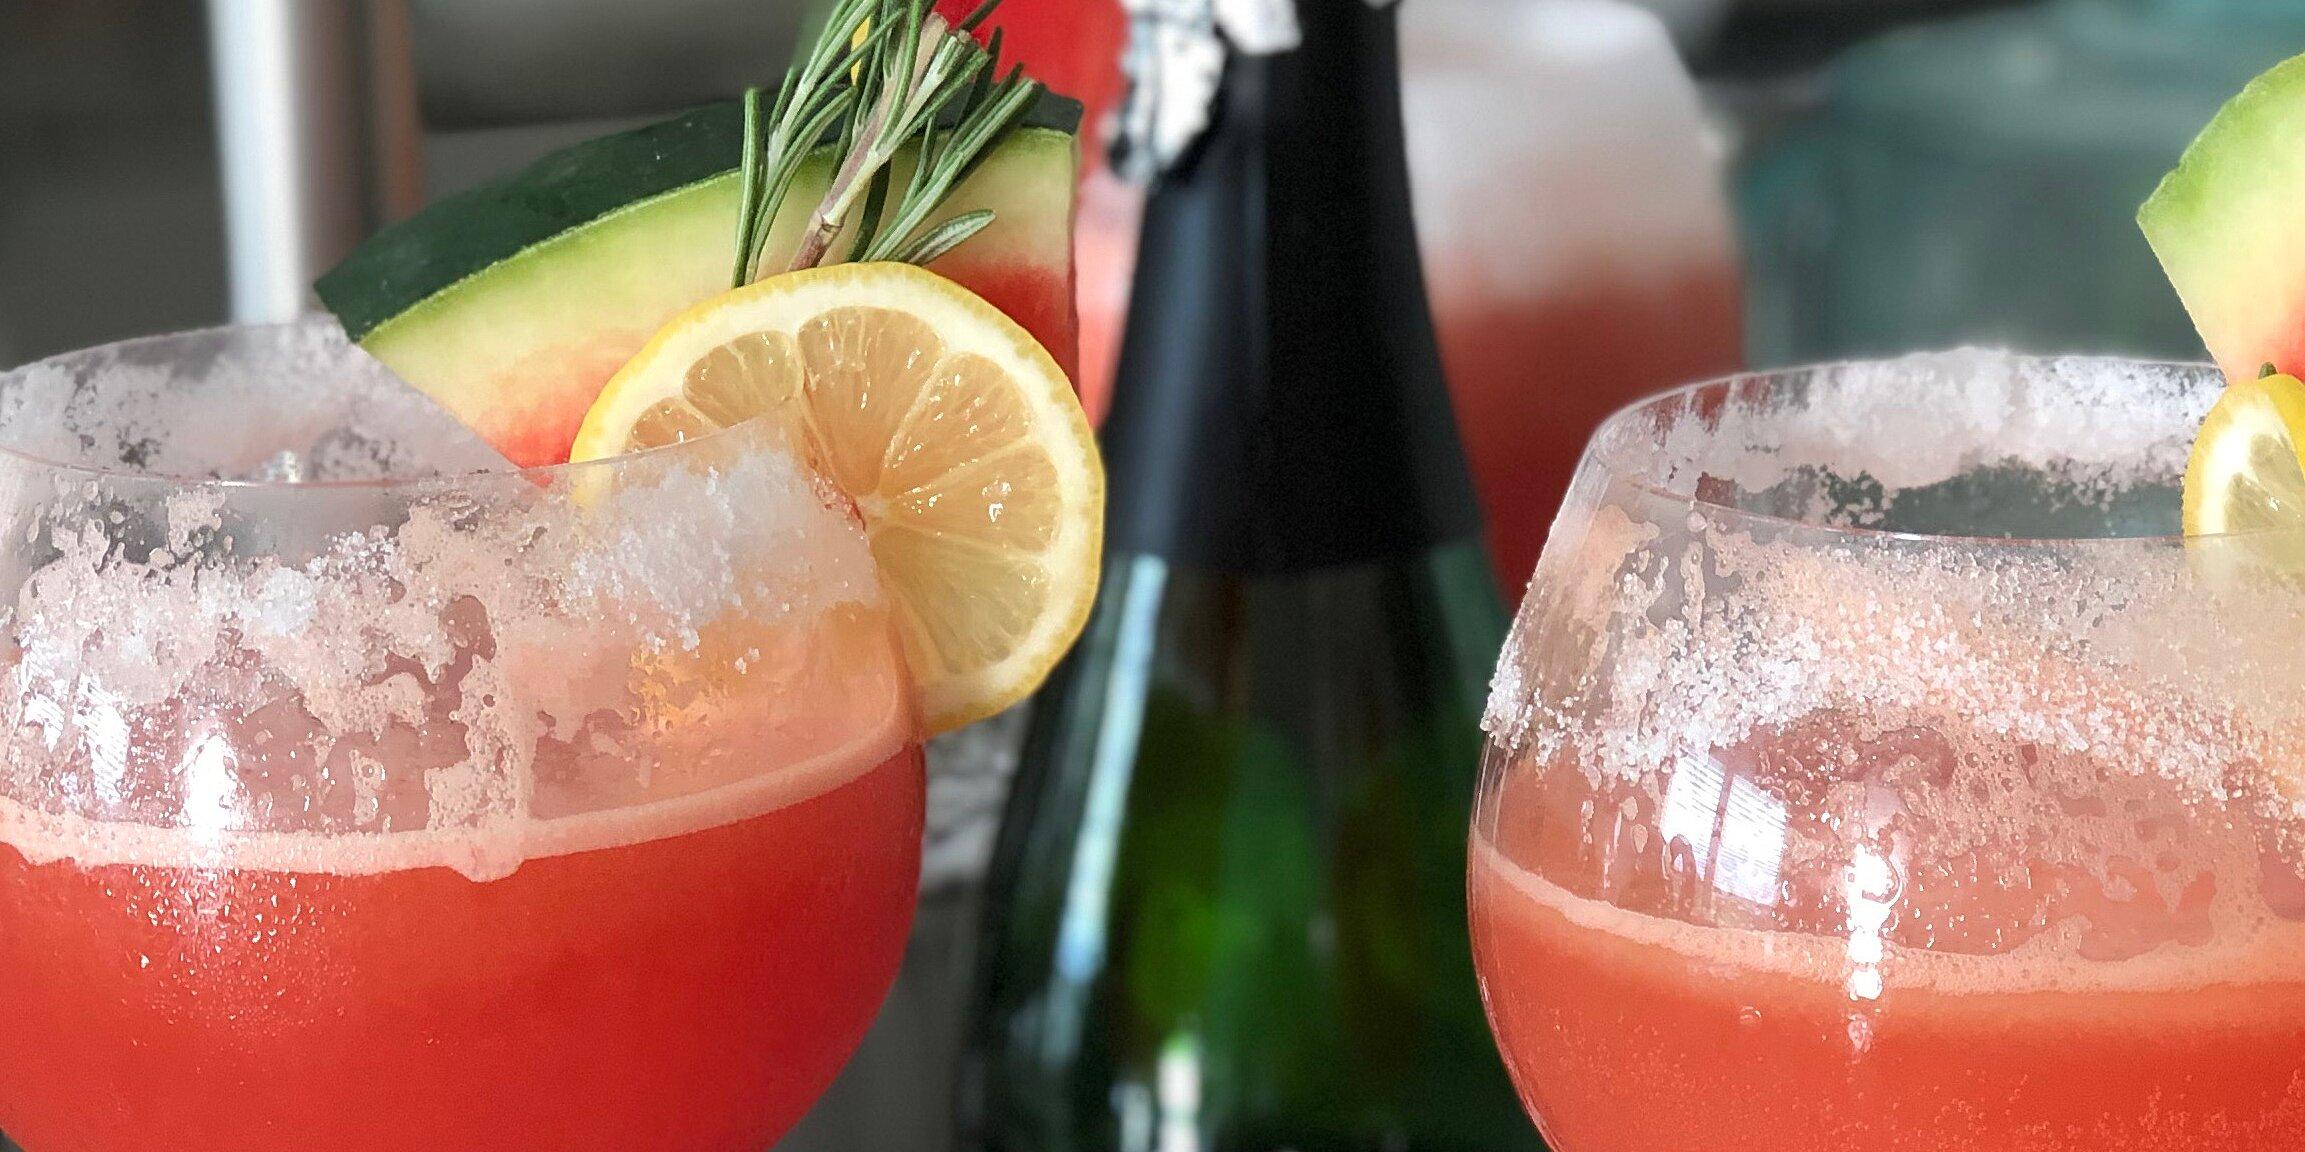 rosemary infused watermelon lemonade recipe